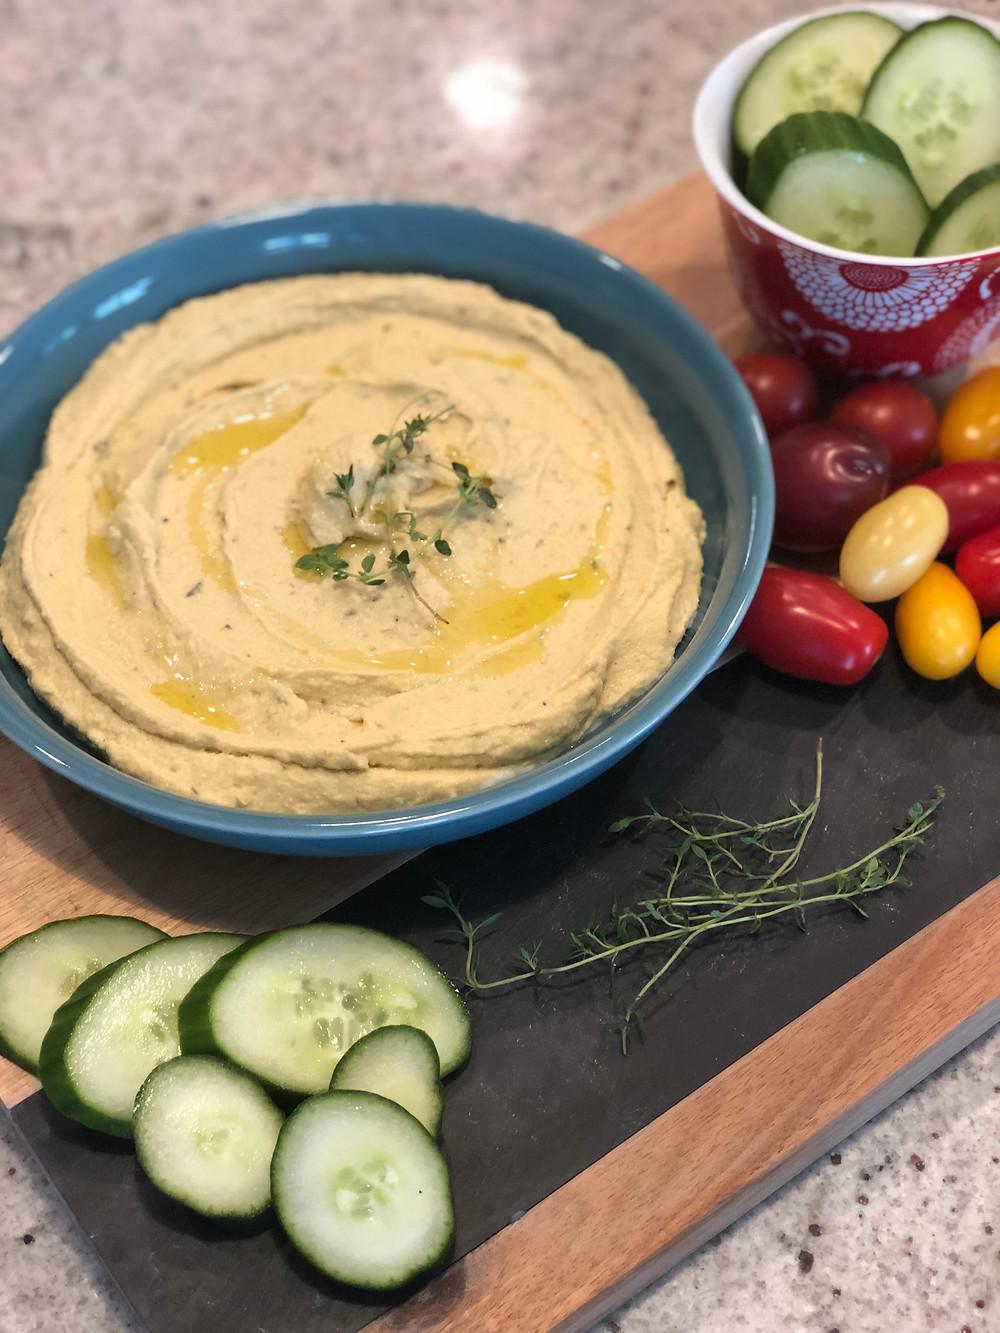 Avocado Hummus, Cucumber, Tomatoes